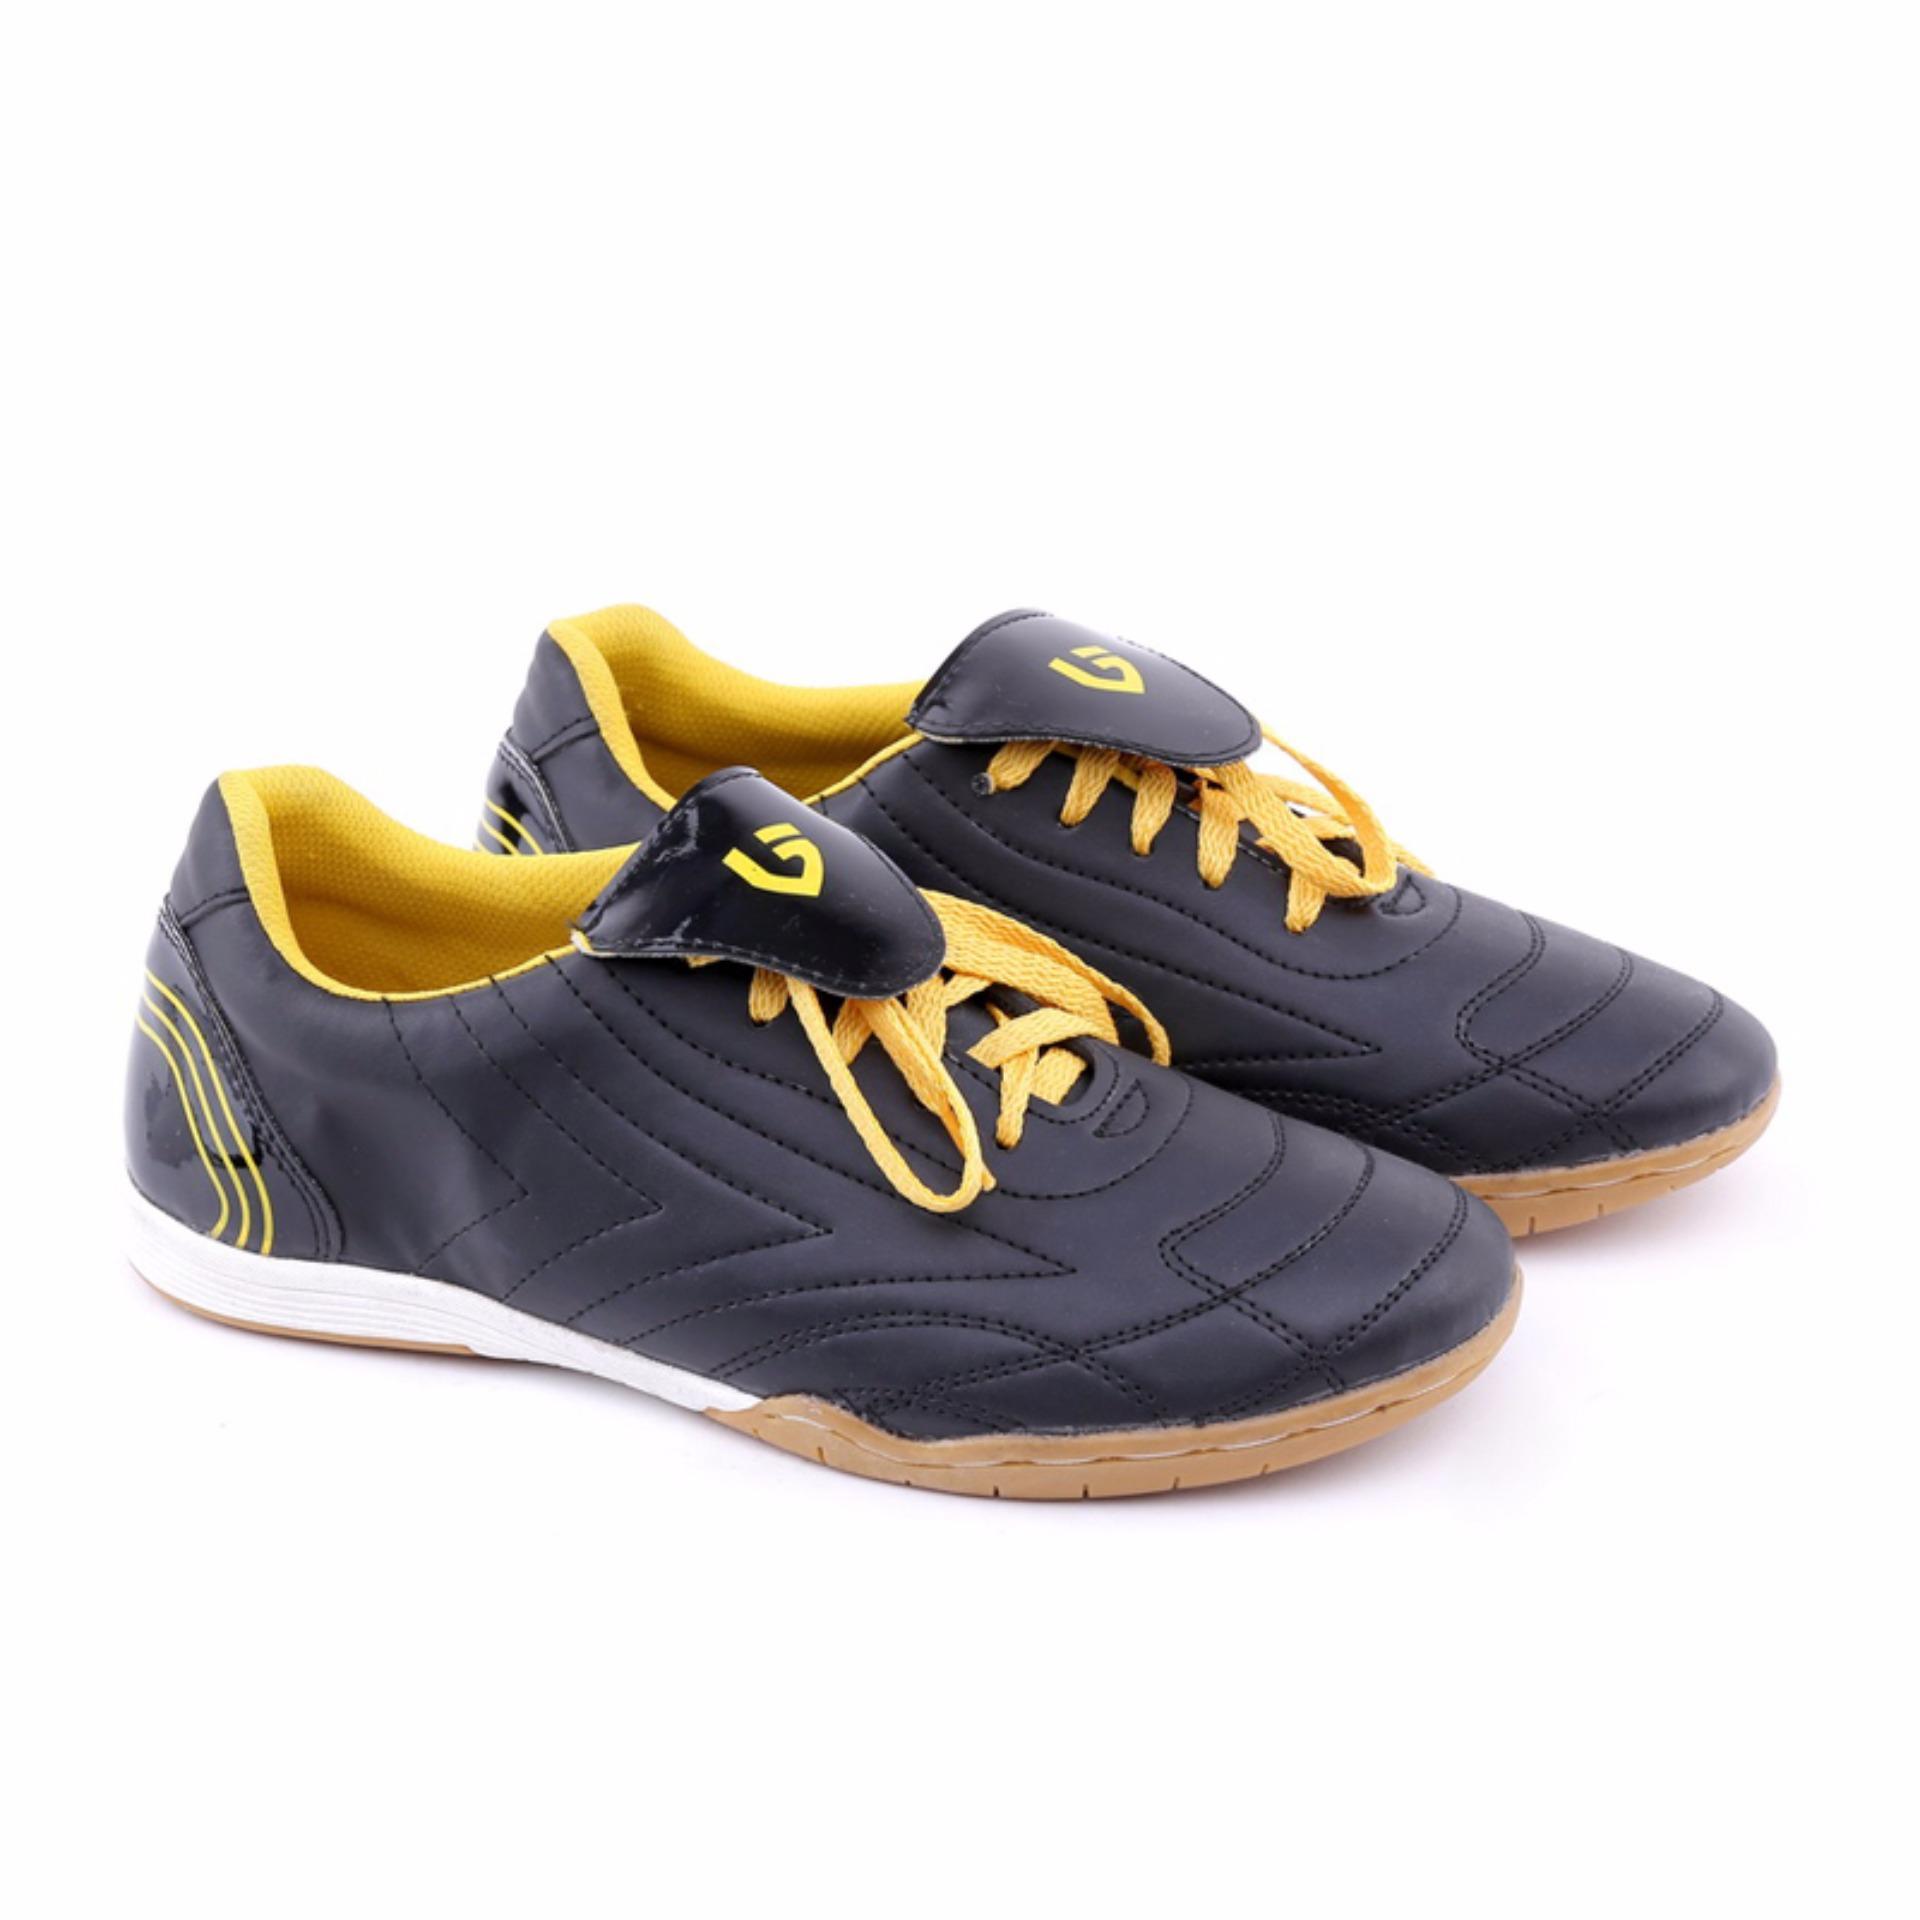 Garucci Sepatu Futsal / Sepatu Olahraga - Futsal Shoes - BahanSynth - GRG 1253